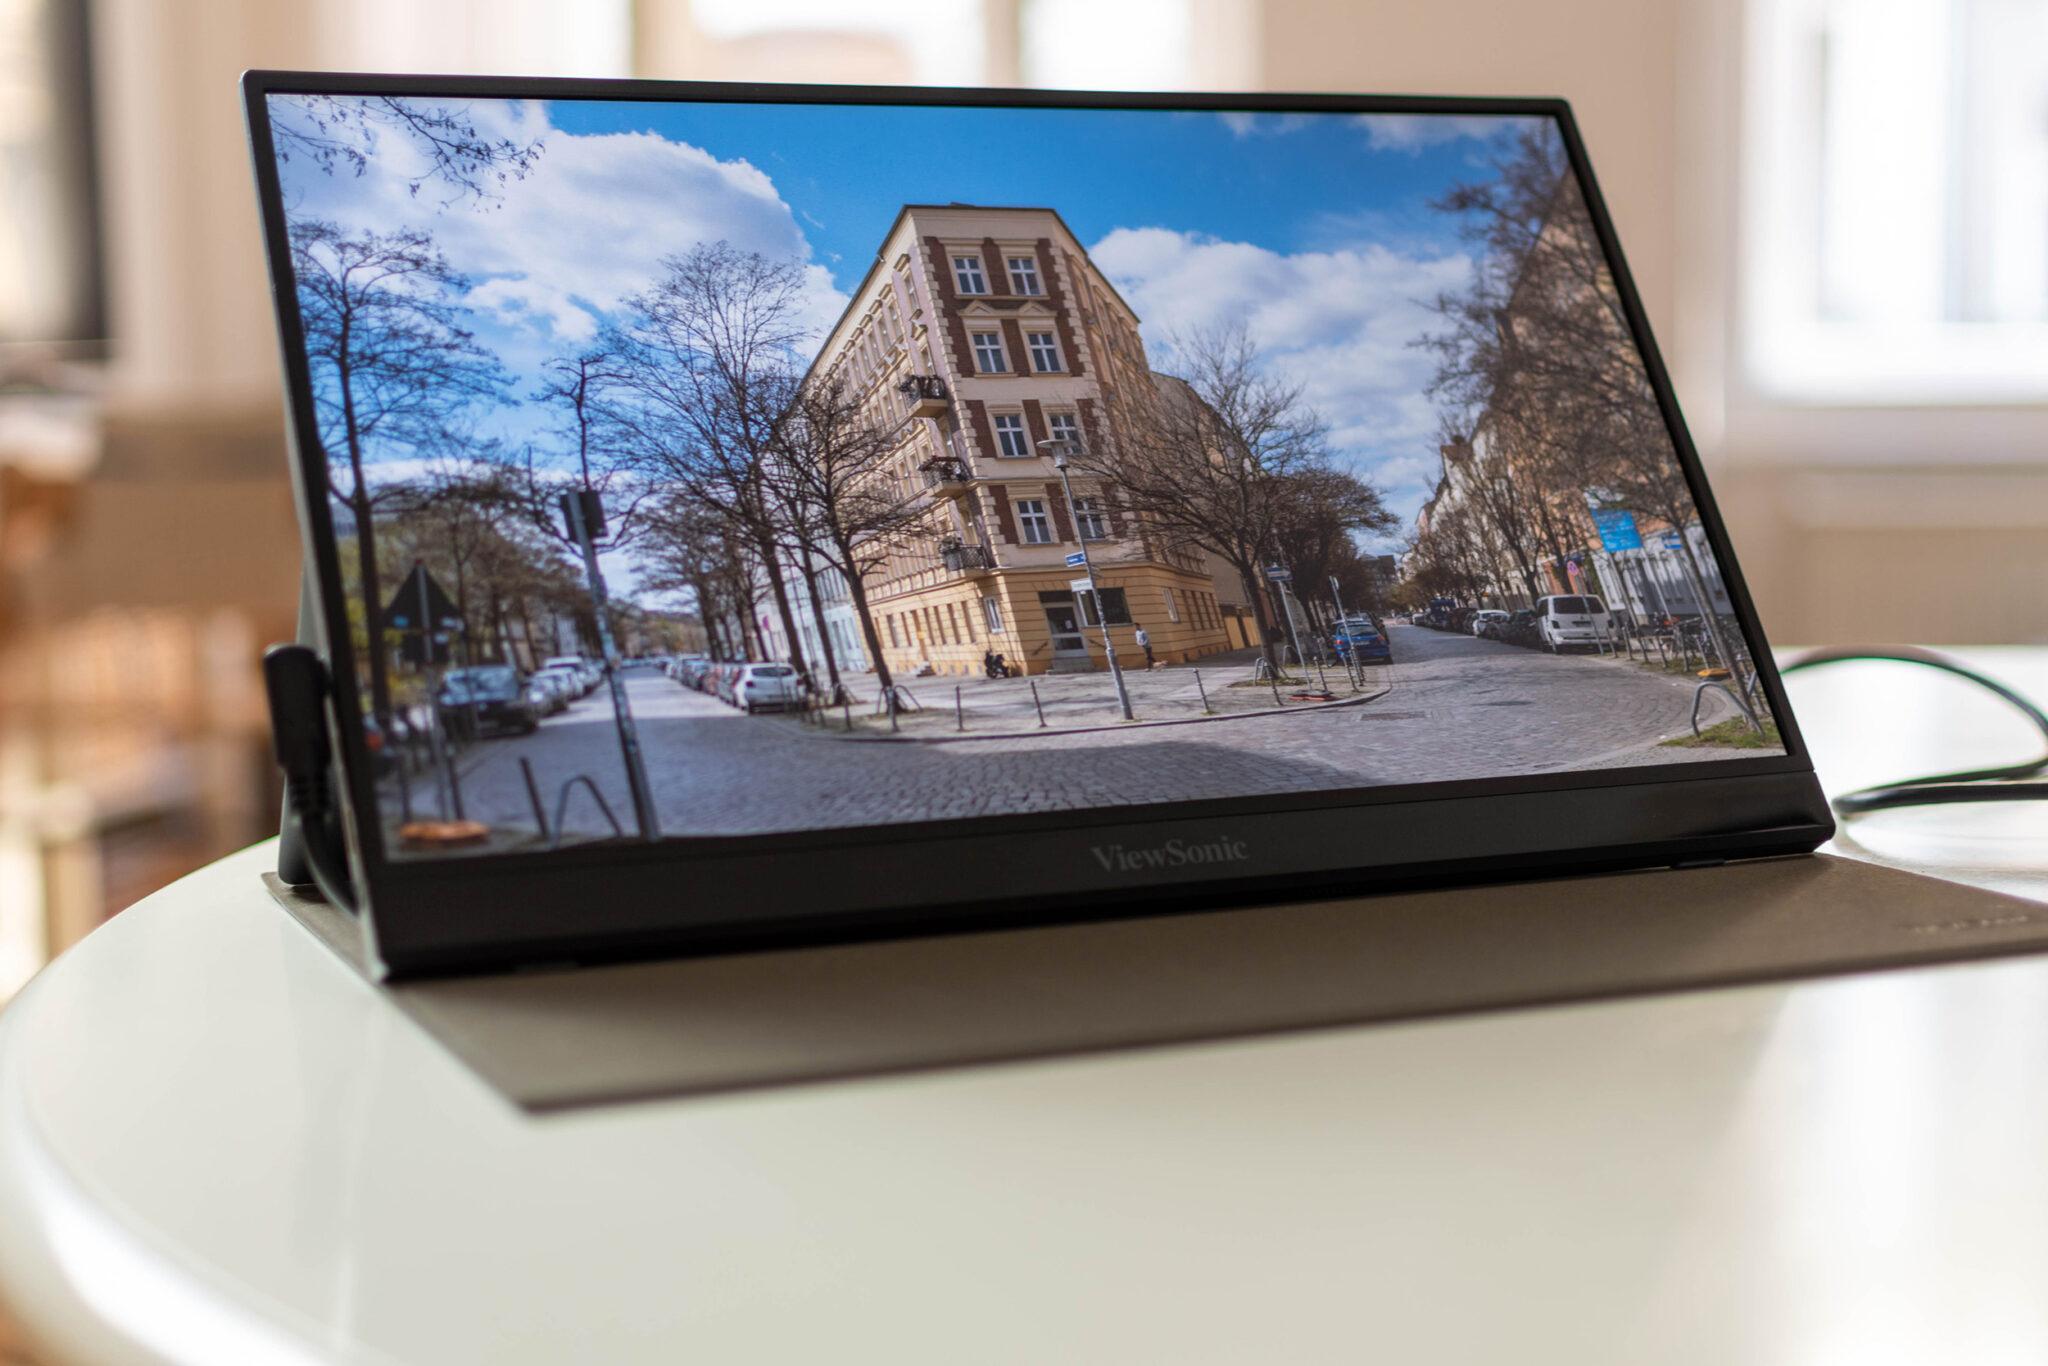 ViewSonic VG1655 mobiler Monitor im Test